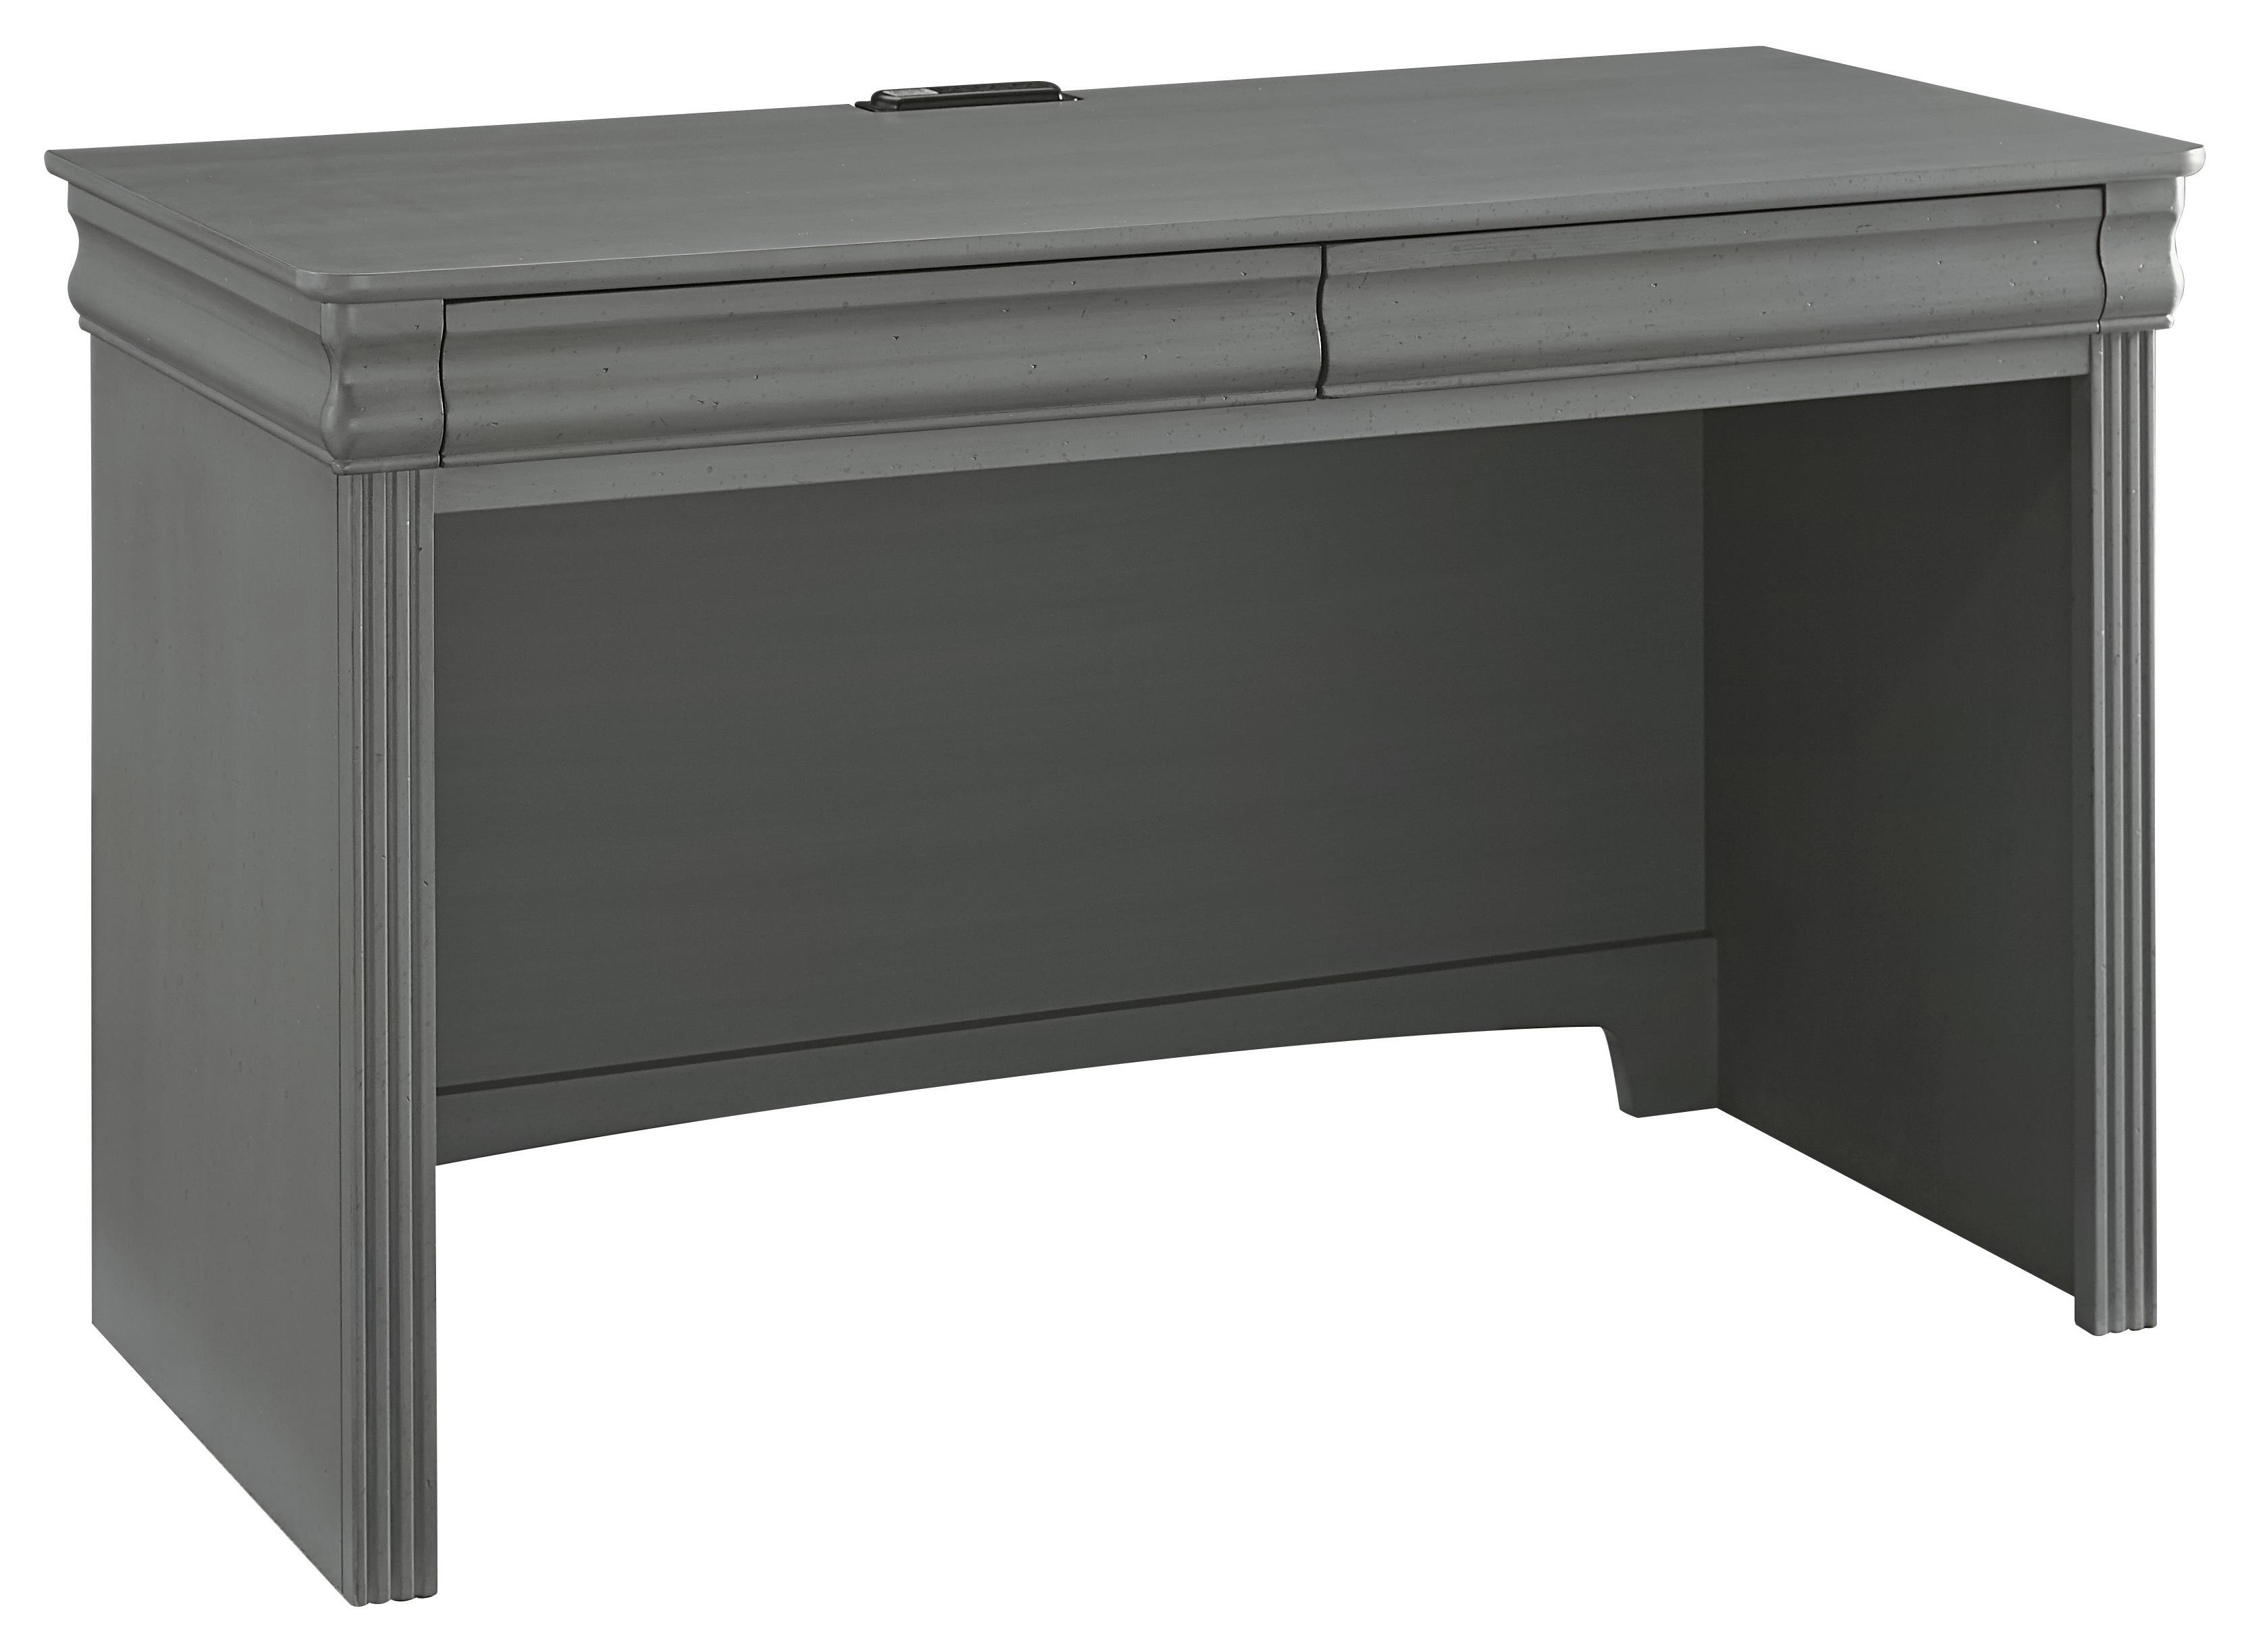 Vaughan Bassett French Market Laptop/Tablet Desk - 2 Drawers & Power Pack - Item Number: 381-778